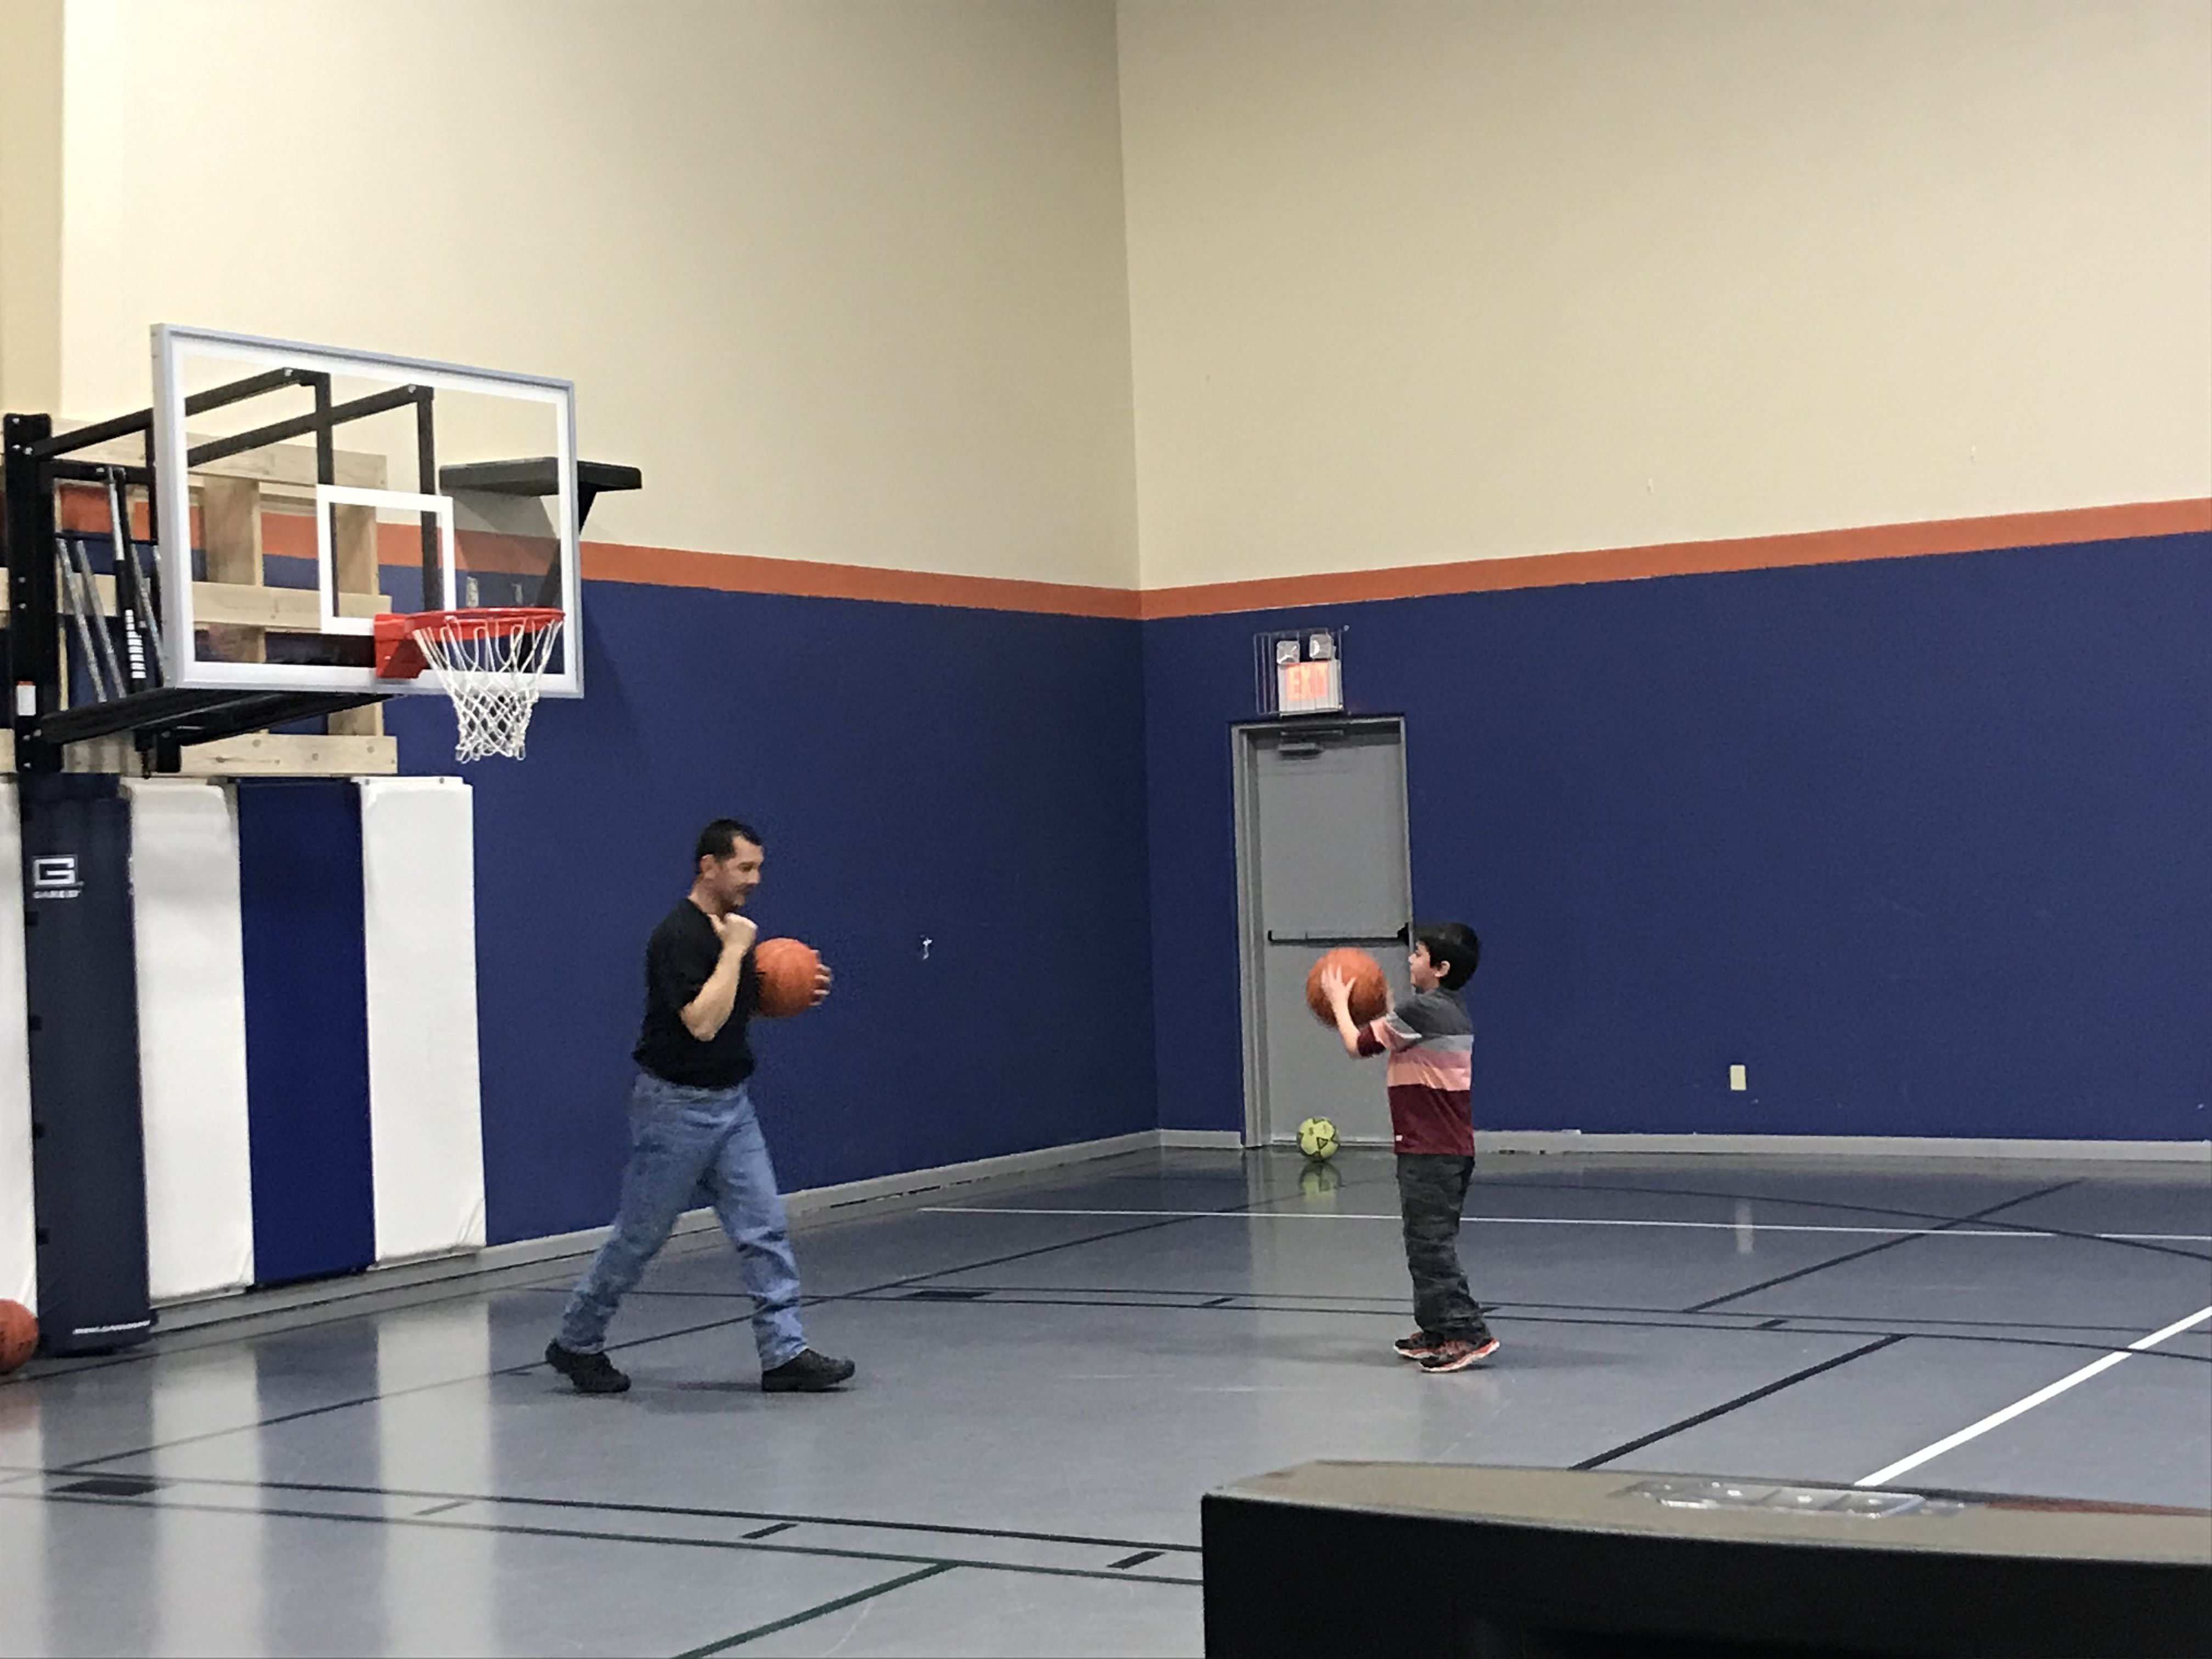 Alpha Rec Center Zone 3 Gym Open Gym Baseball Ticket Basketball Rules